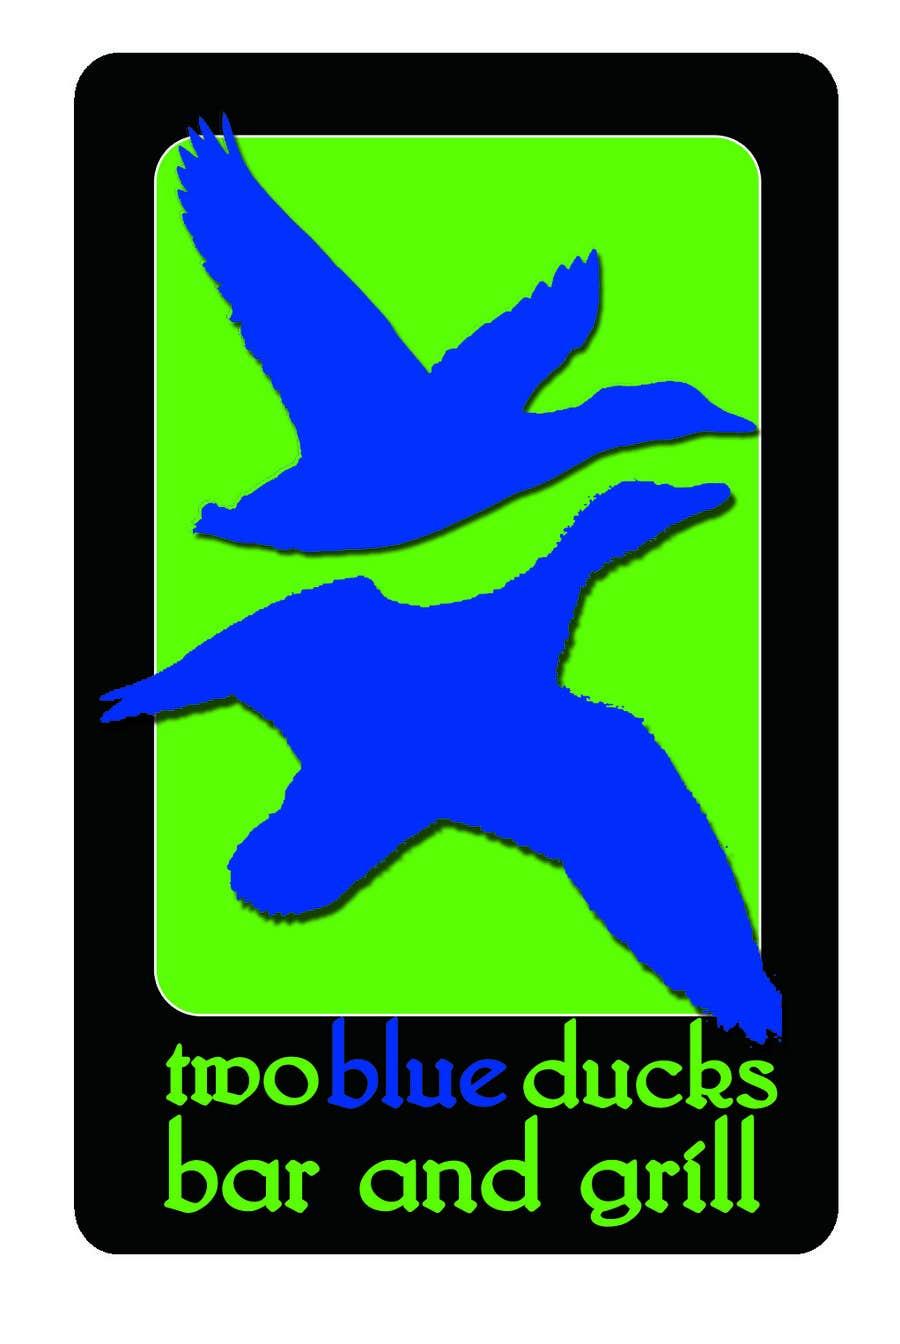 Kilpailutyö #27 kilpailussa Design a Logo for two blue ducks bar and grill